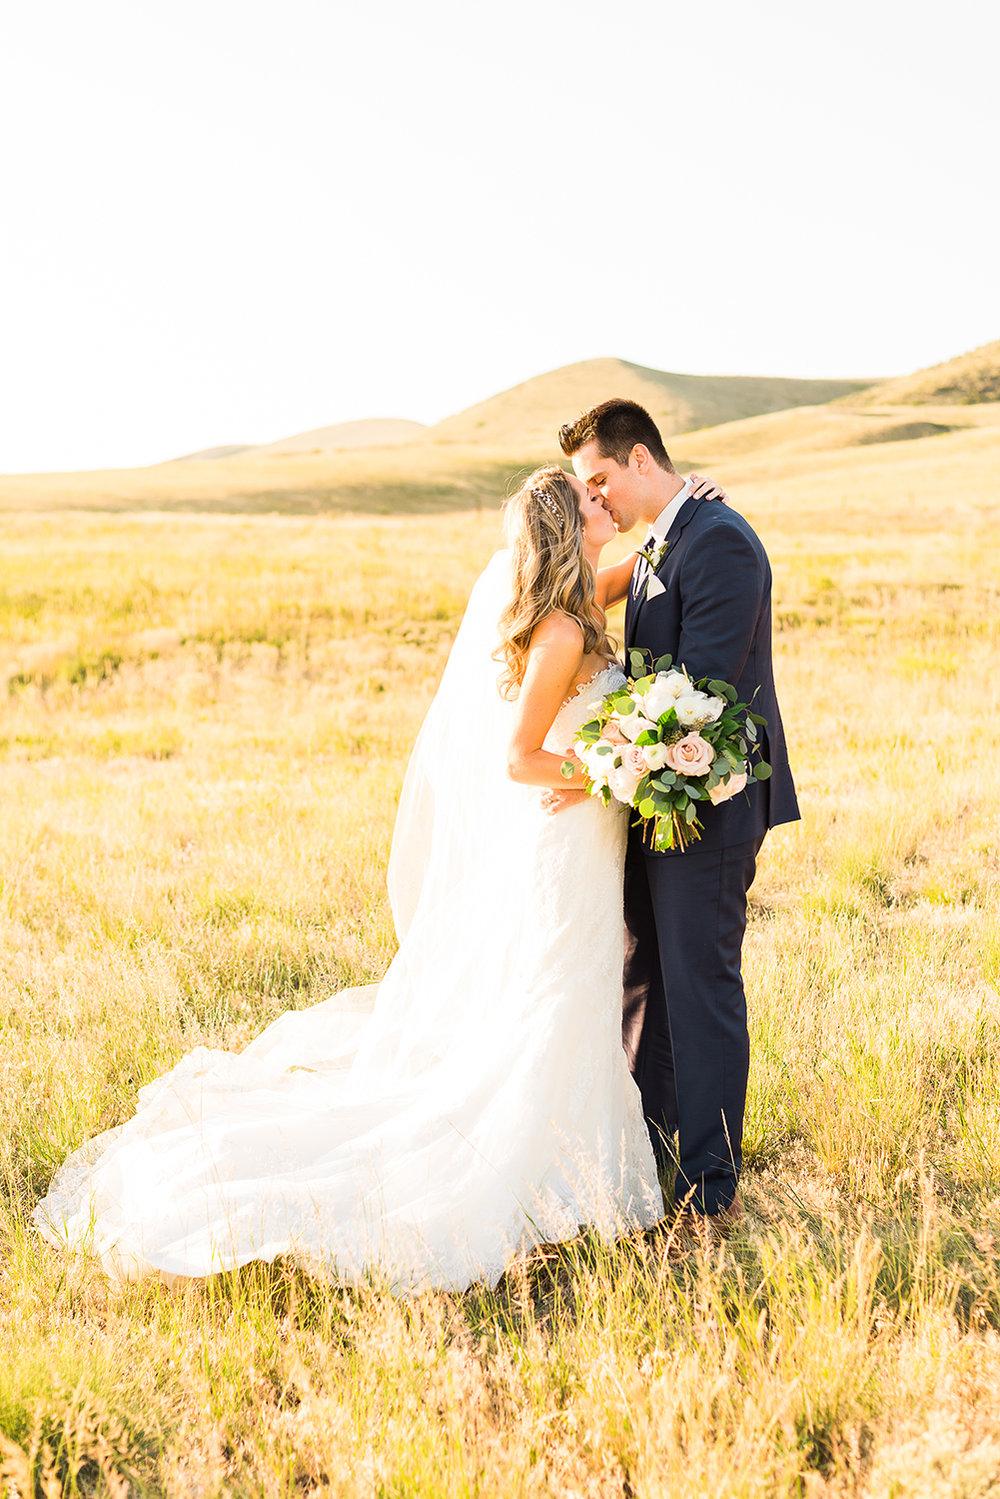 The-Retreat-At-Solterra-Wedding-Denver-Wedding-Photographer-42.jpg